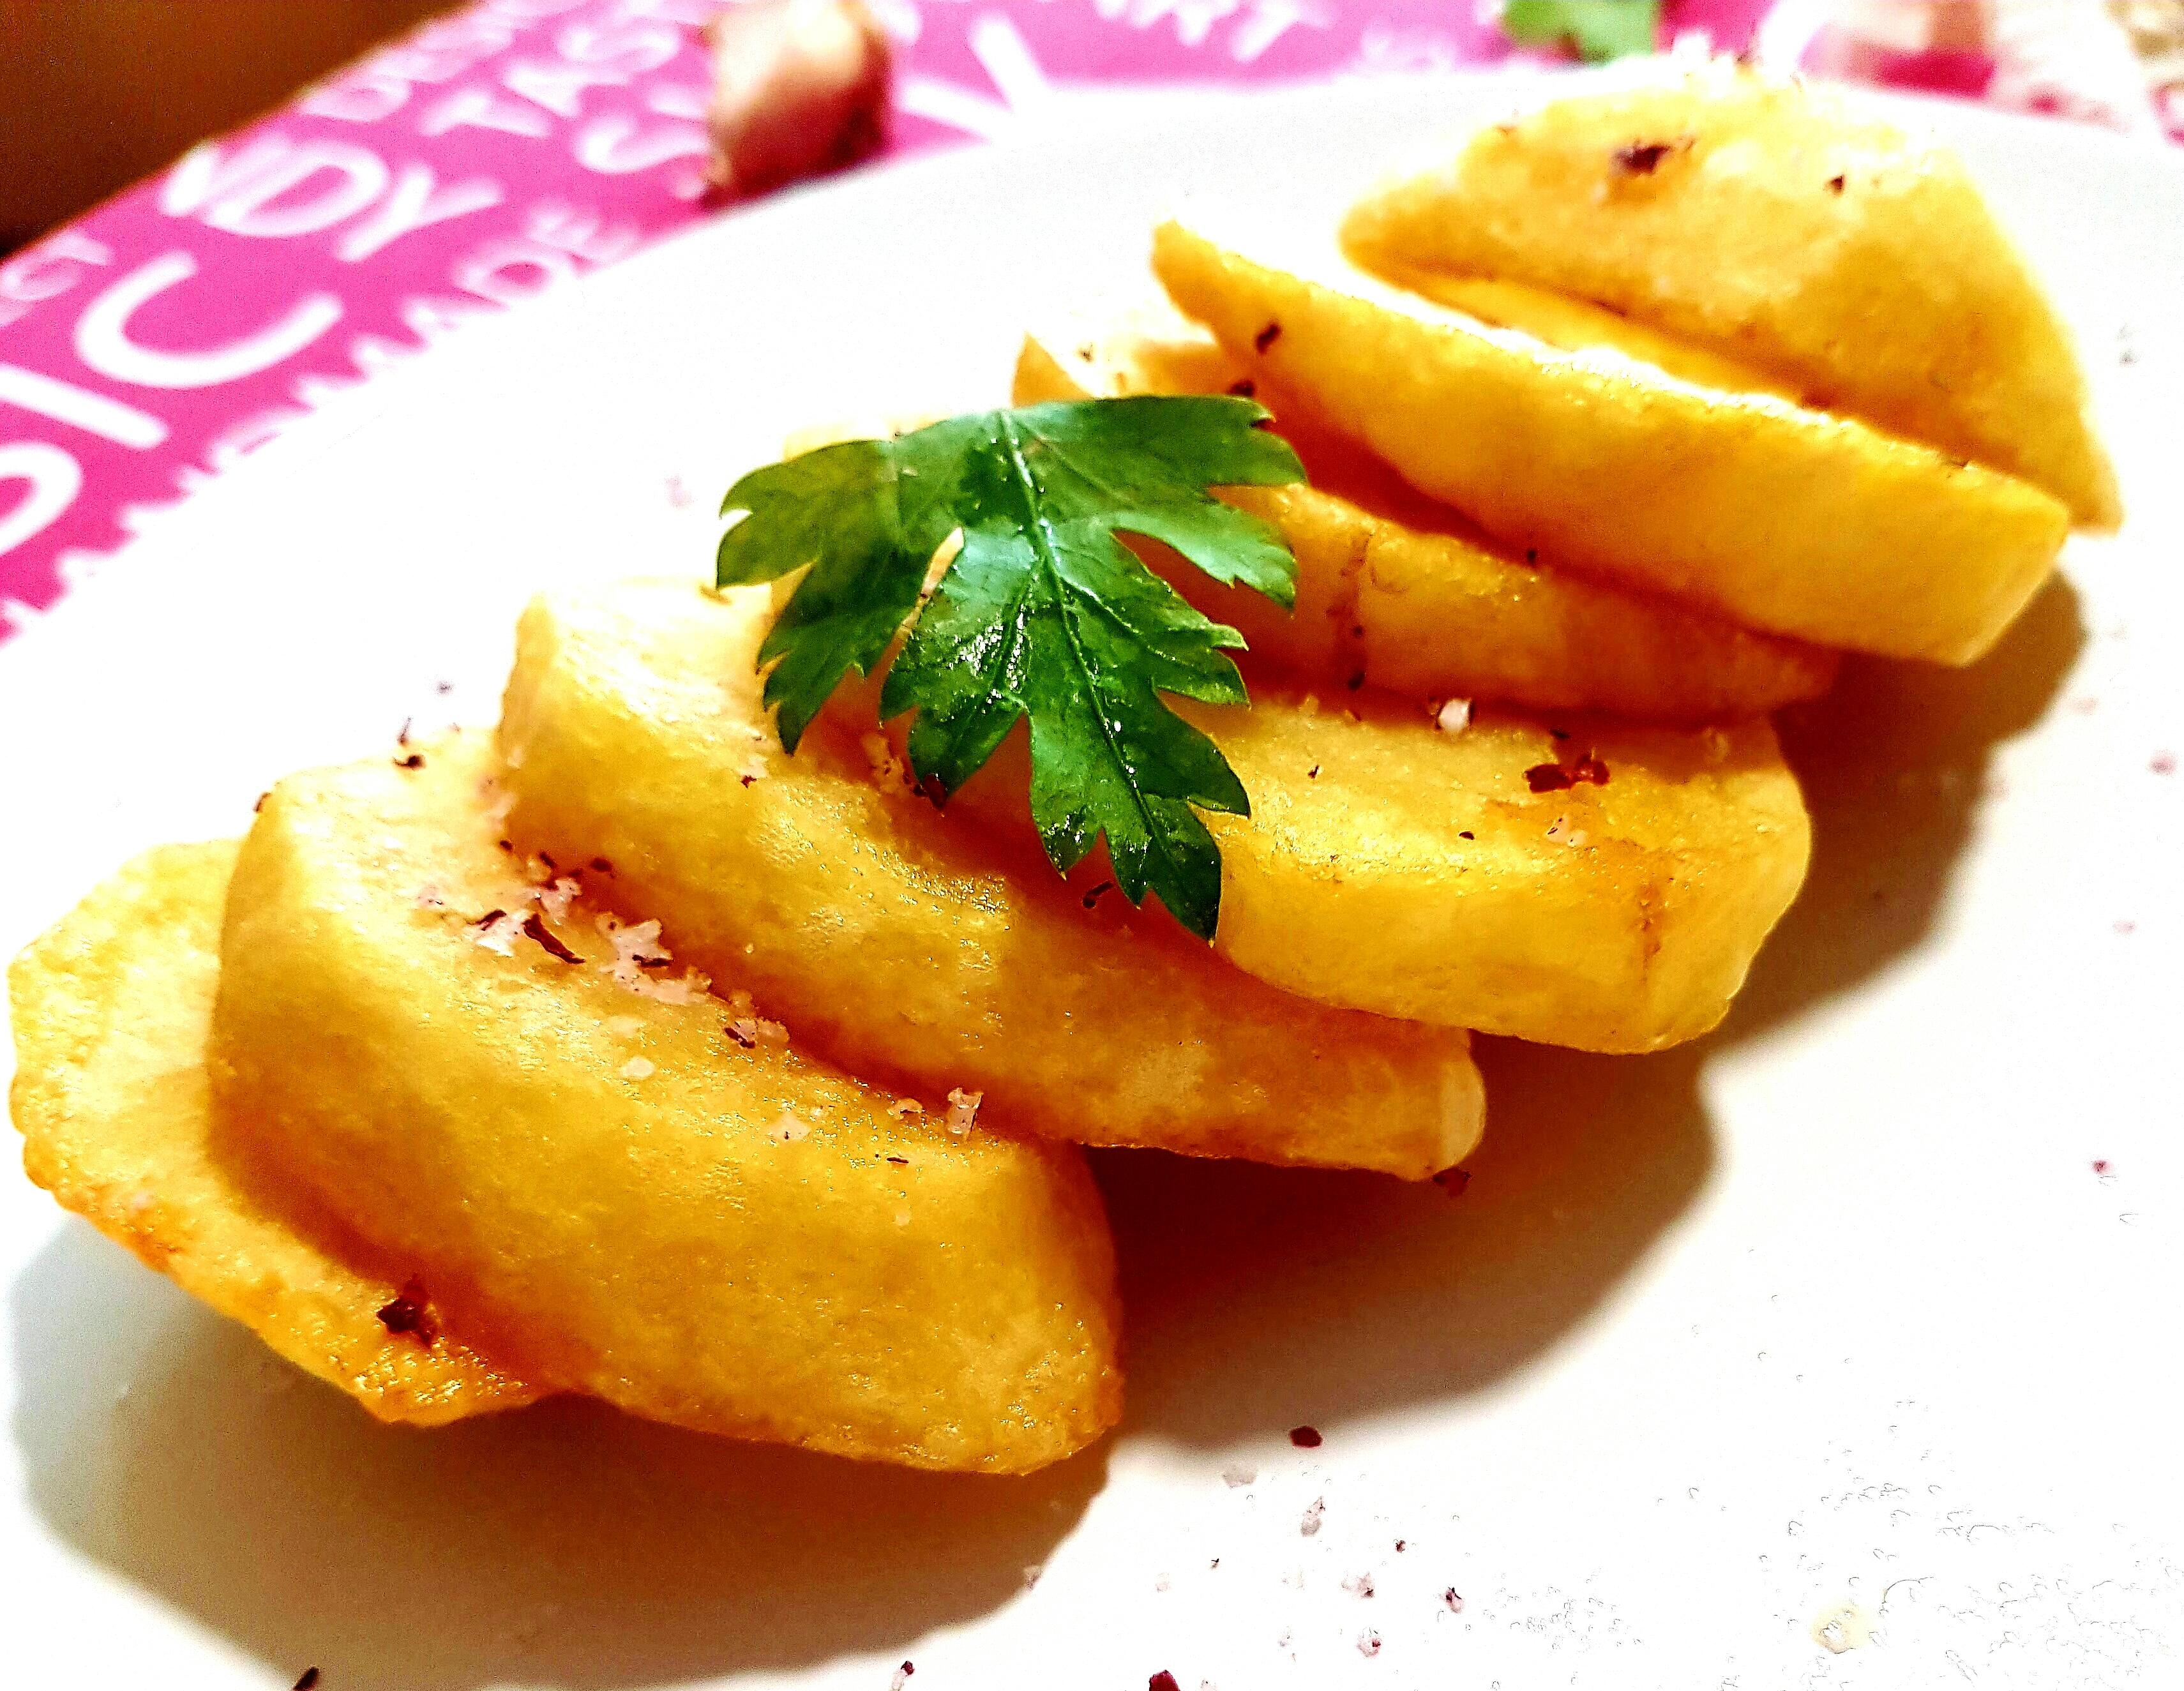 patatas papas fritas confitadas